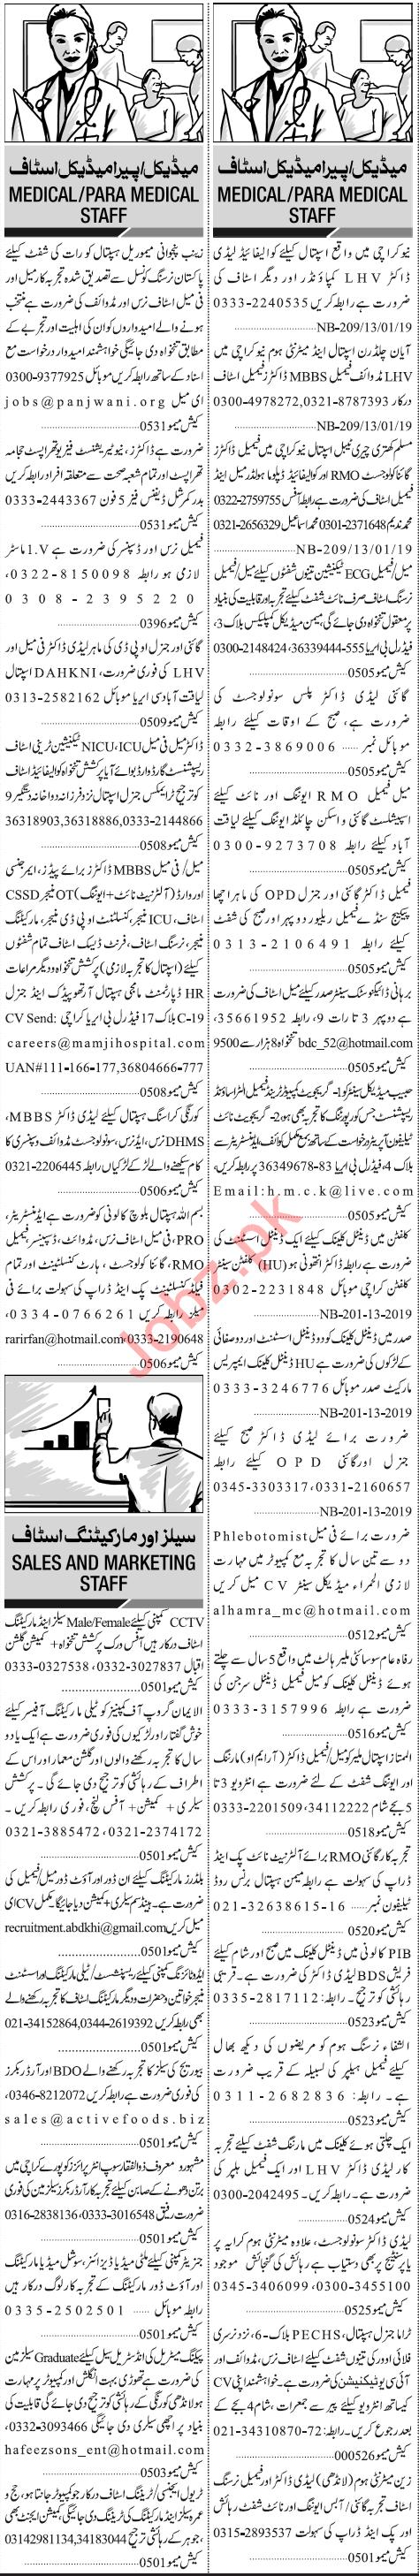 Jang Sunday Classified Ads 13th Jan 2019 Paramedical Staff